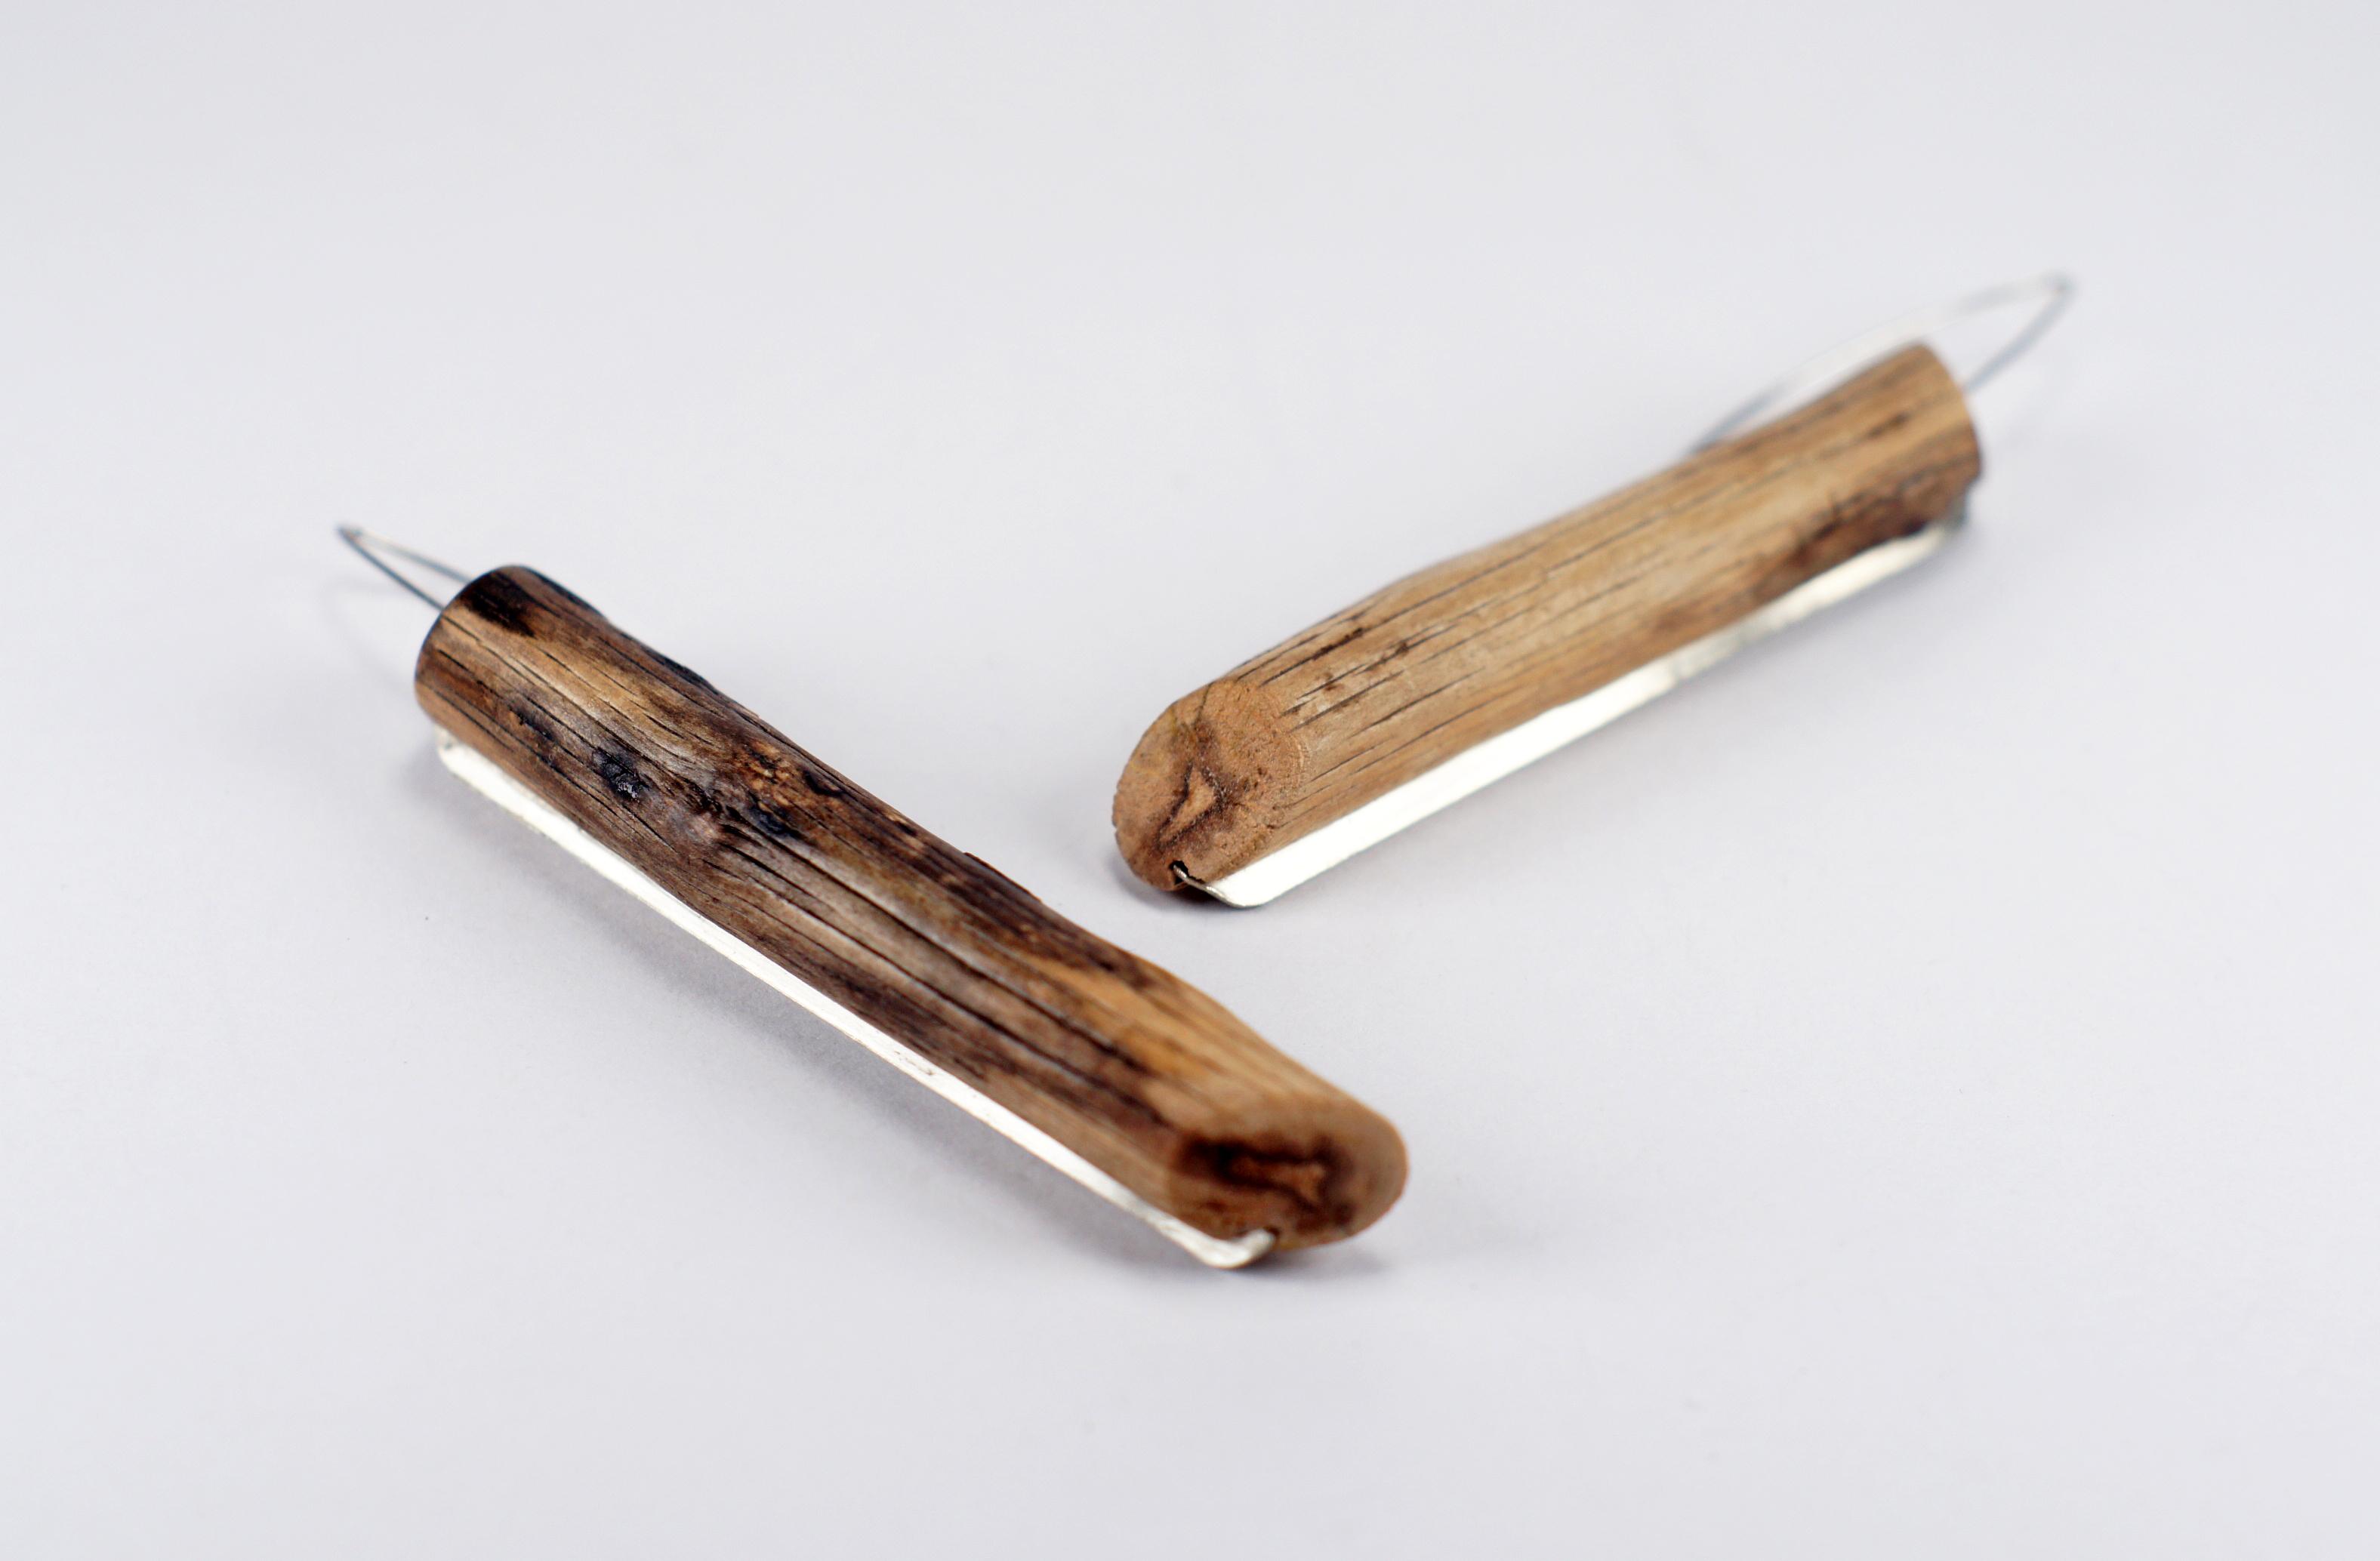 Обеци `From one piece` - обеци, направени от едно дръвче, намерено около Силистар – стоматологична тел и алпака.